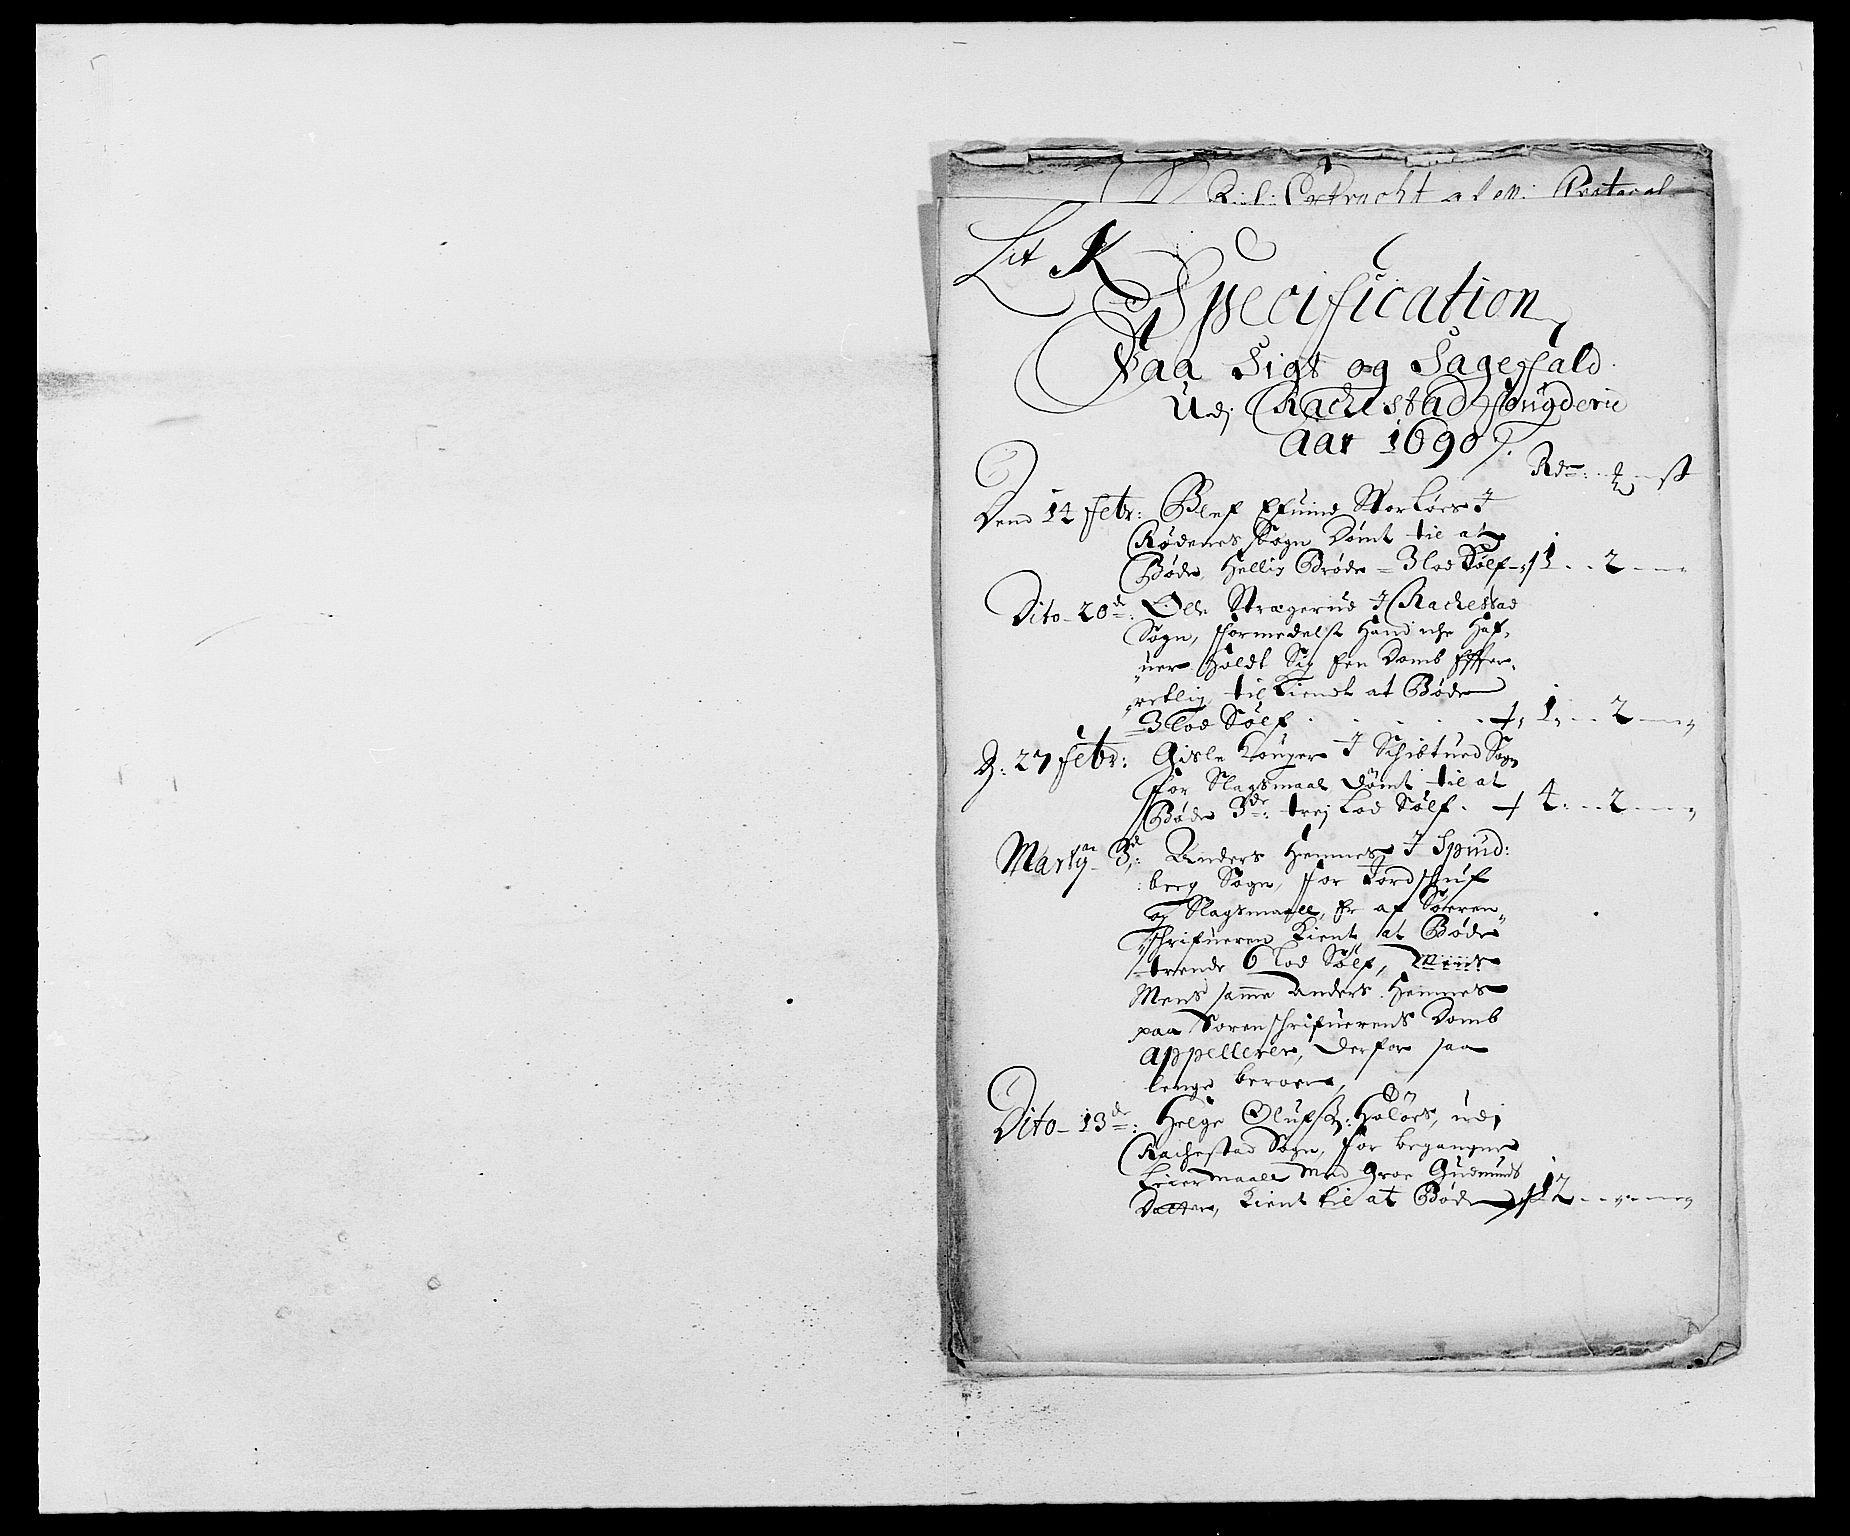 RA, Rentekammeret inntil 1814, Reviderte regnskaper, Fogderegnskap, R05/L0277: Fogderegnskap Rakkestad, 1689-1690, s. 190